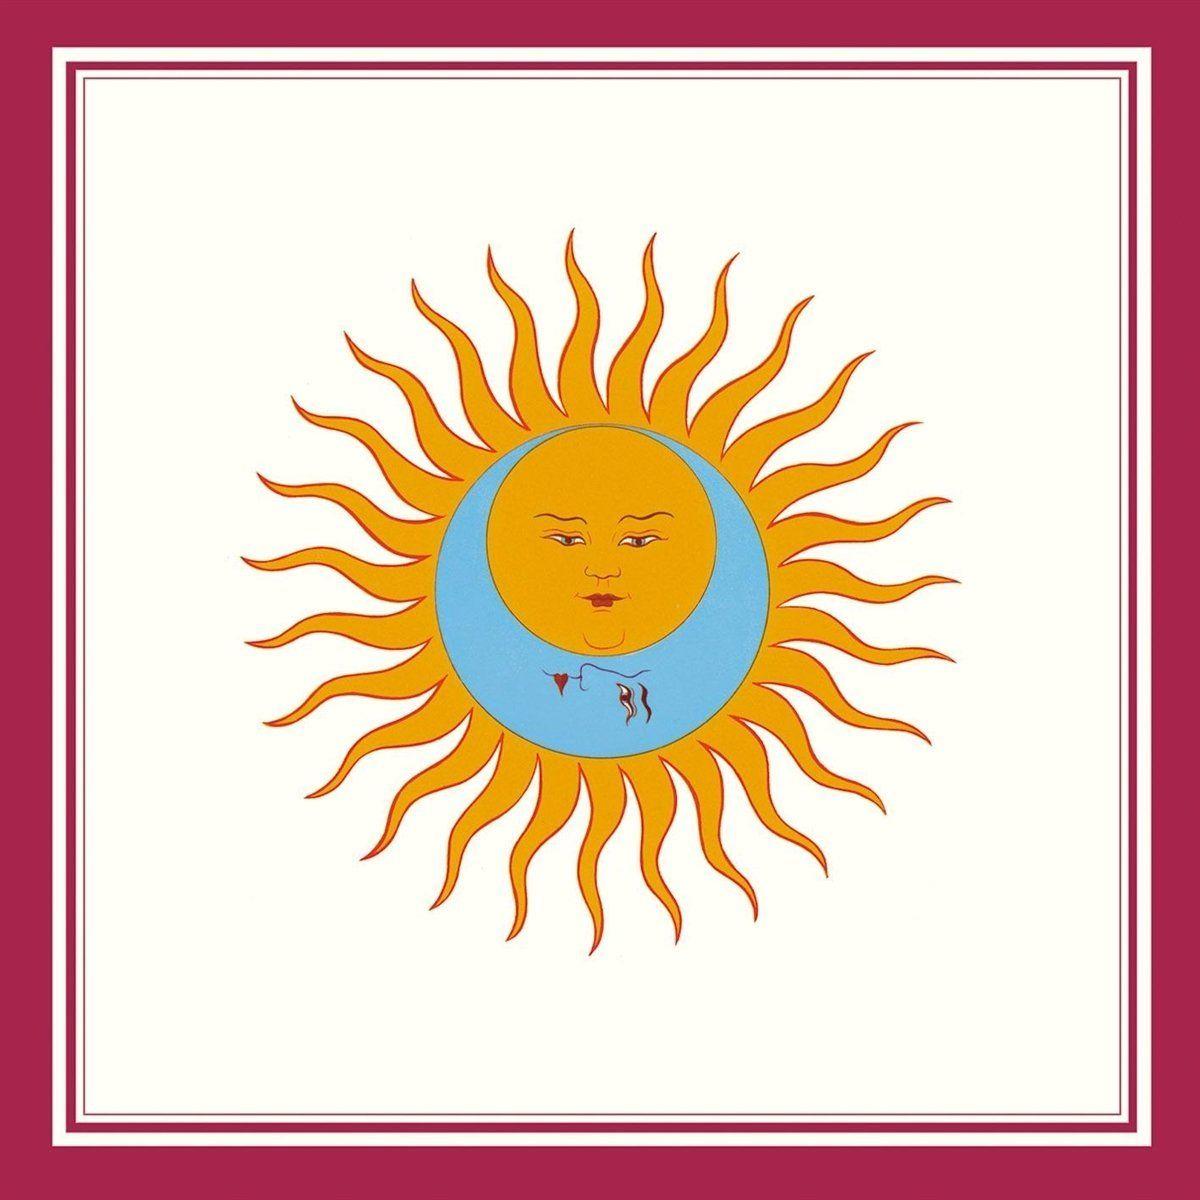 King Crimson|Lark's Tongues in Aspic